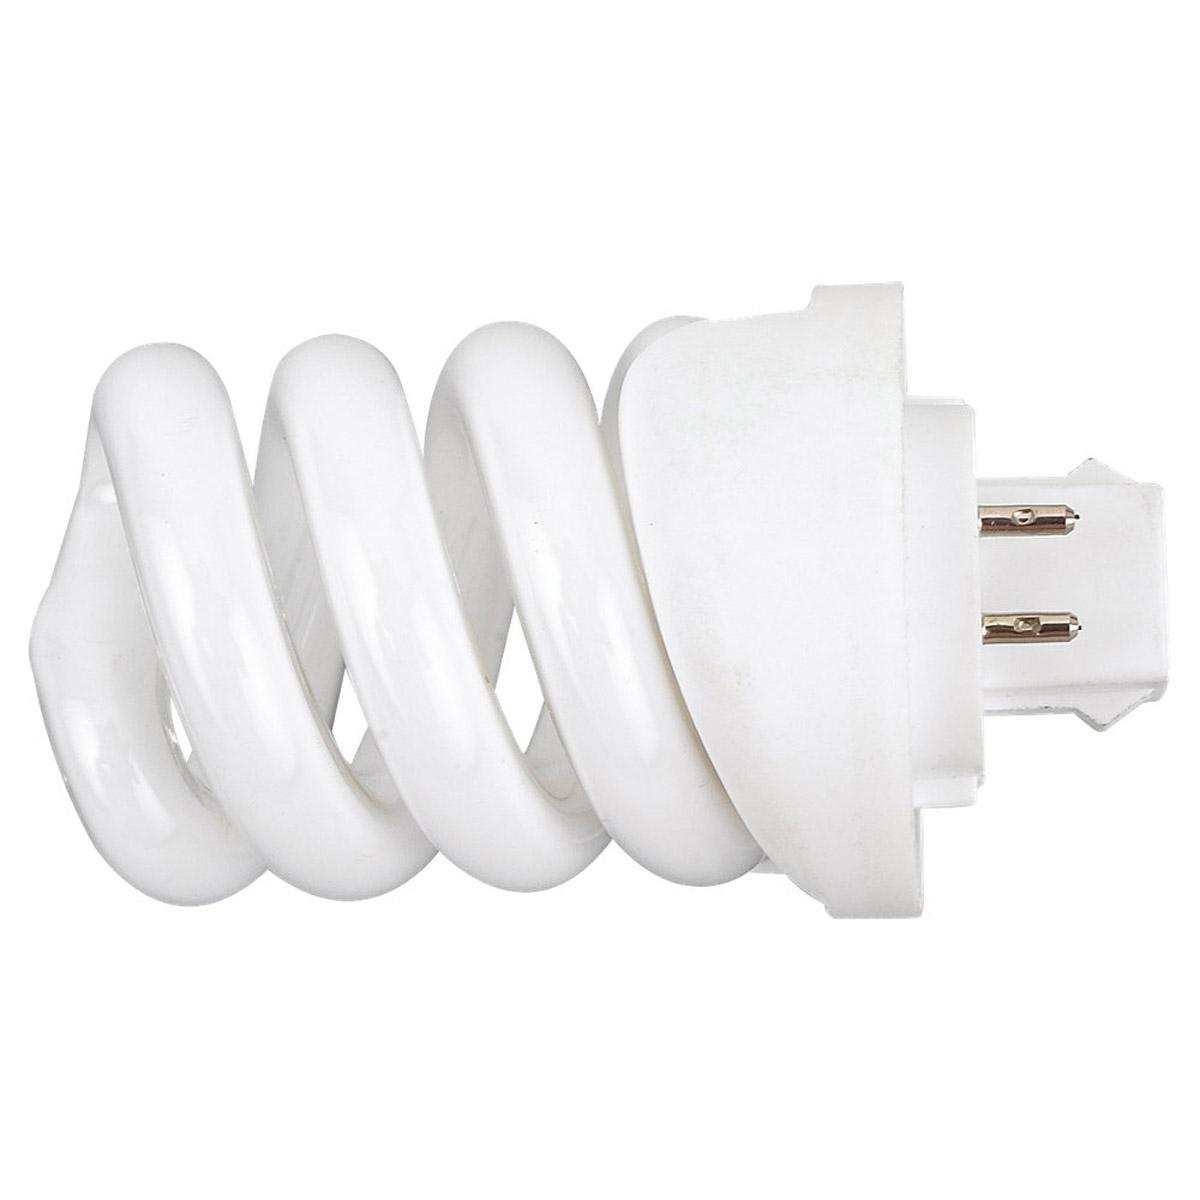 Sea Gull Lighting PLS26 Spiral Fluorescent Bulb 97045 photo